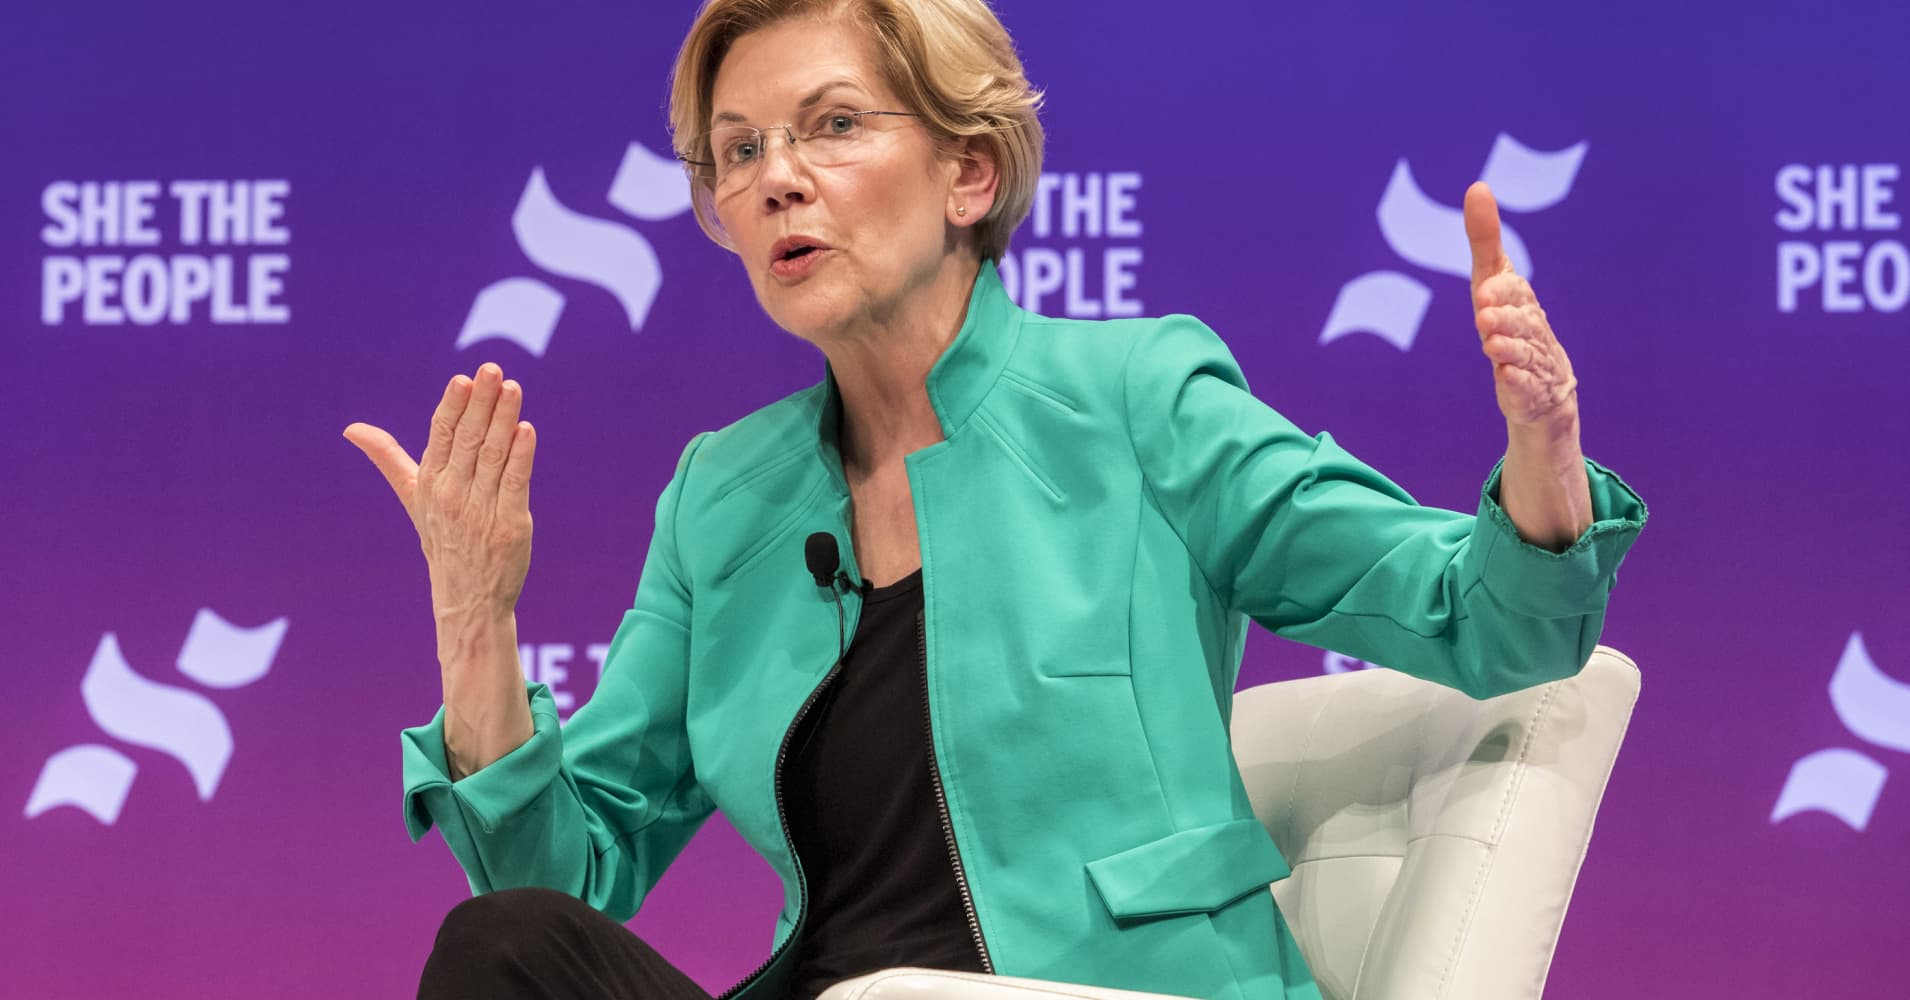 How Elizabeth Warren student loan relief plan affects the rich